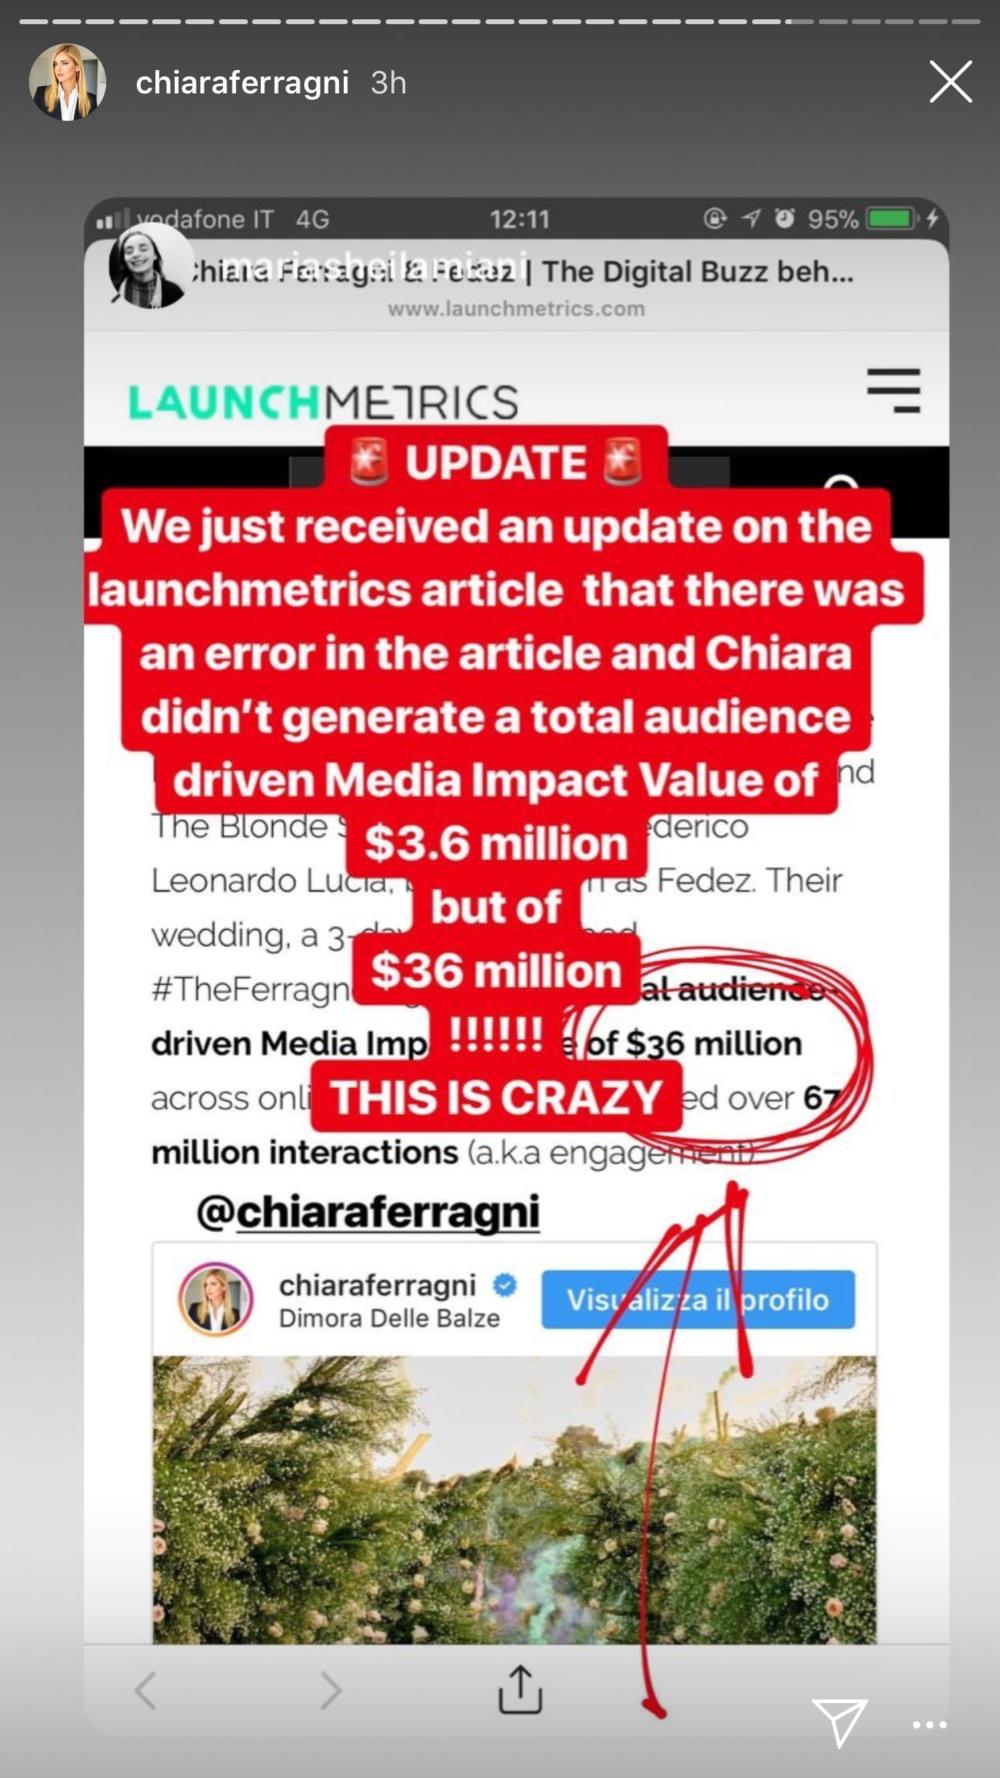 Chiara's Instagram Story